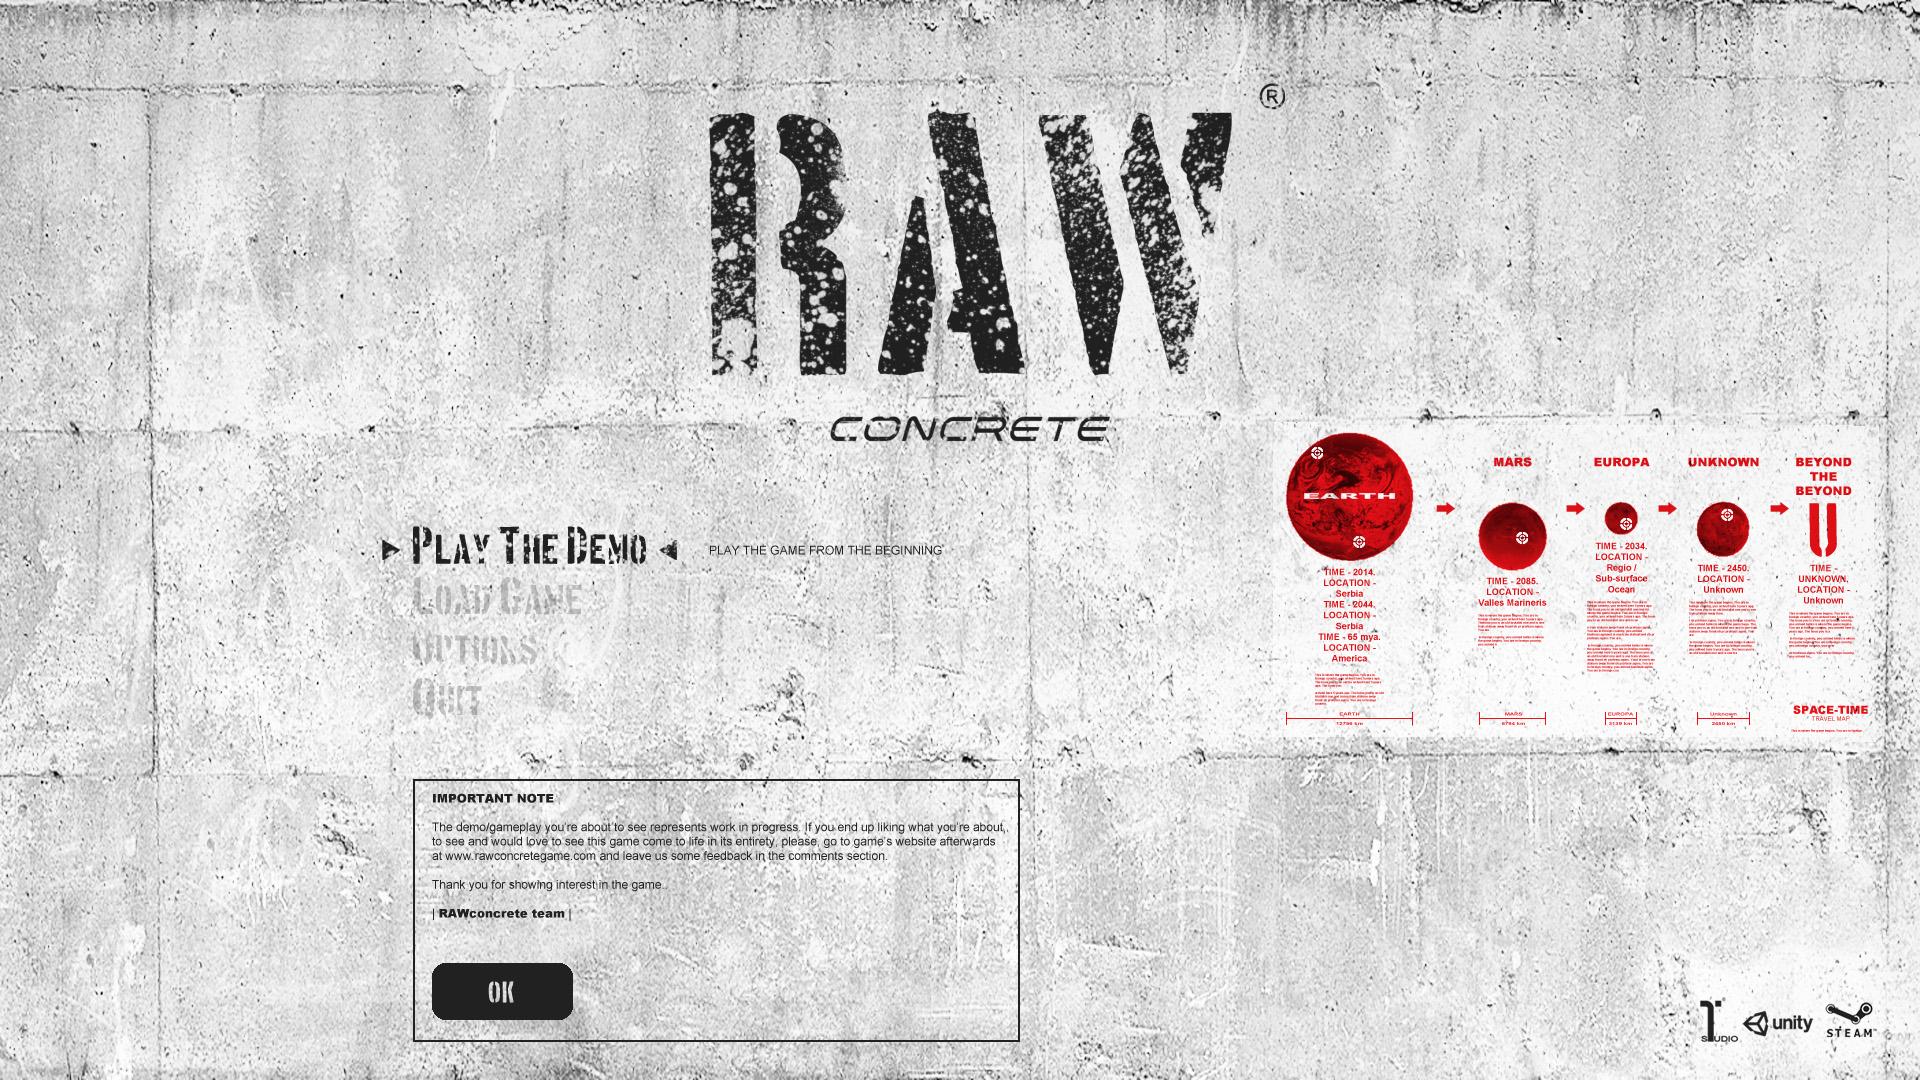 RAWconcrete2Dgame MainMenu4